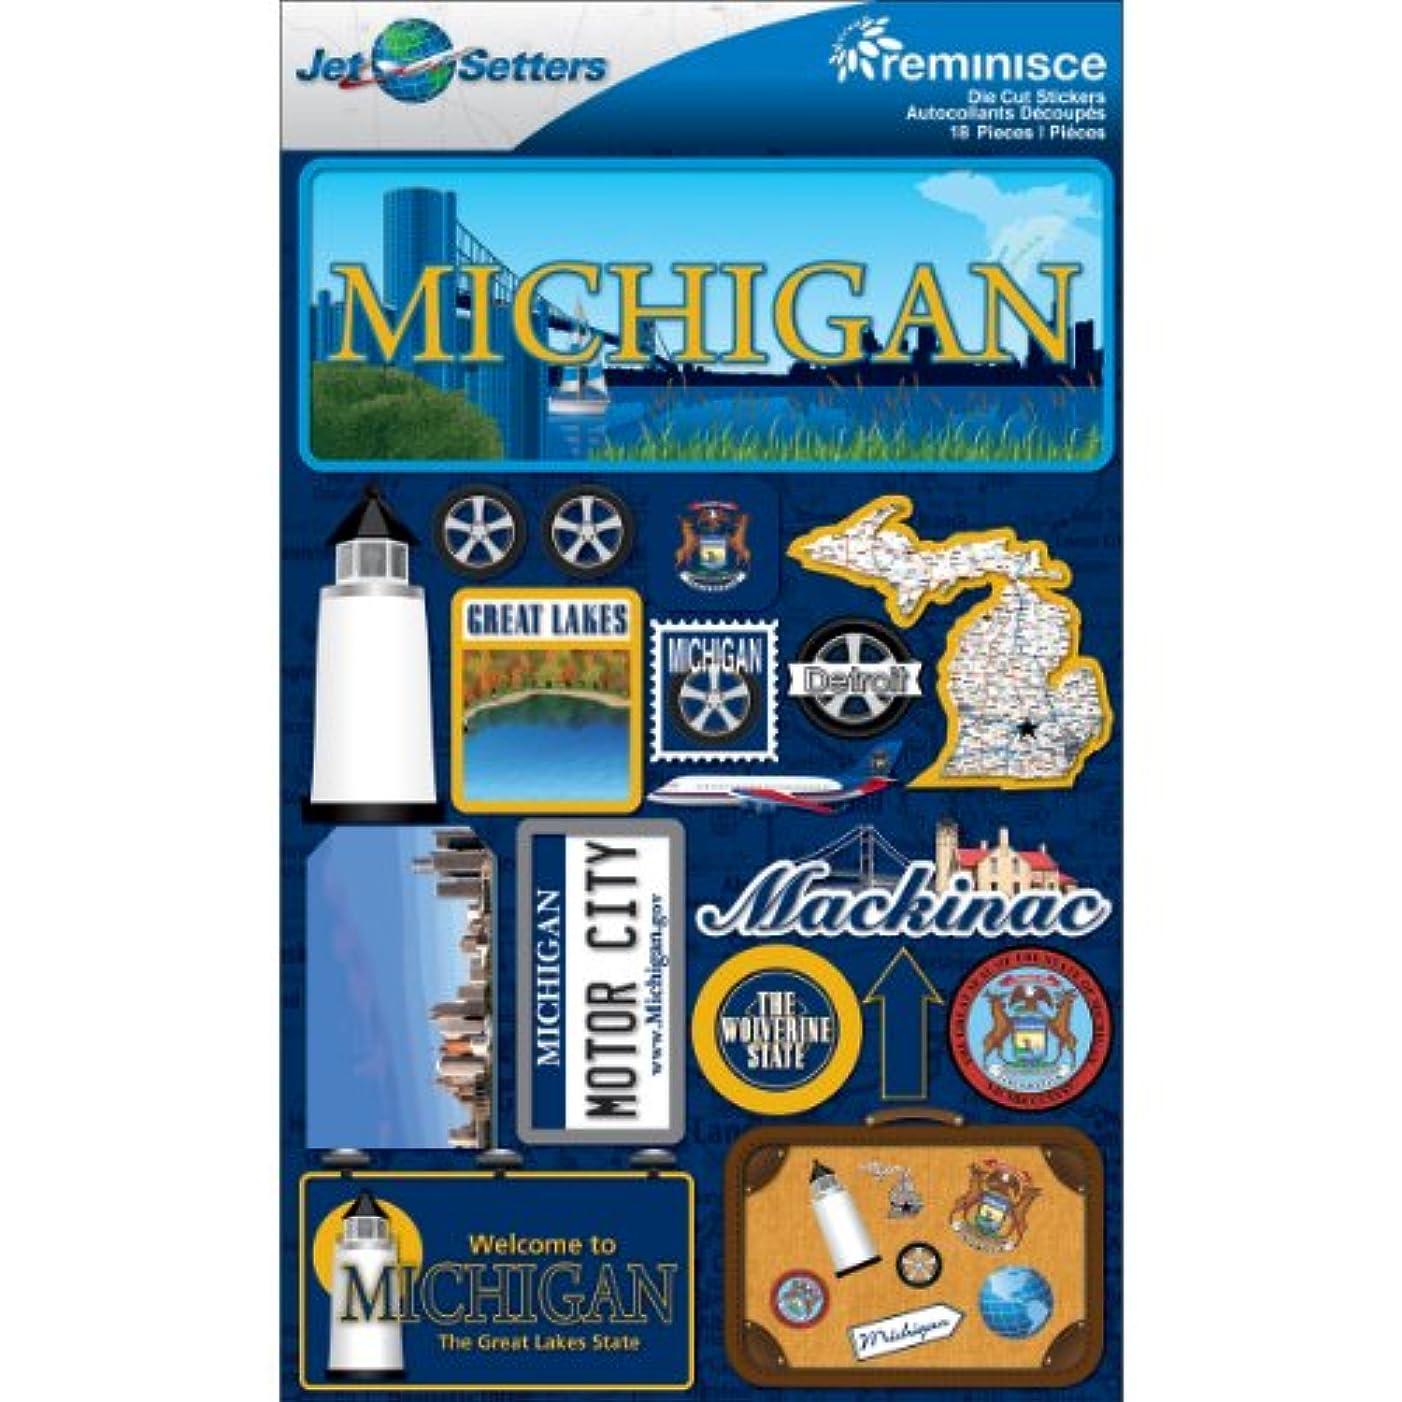 Reminisce Jet Setters 2 3-Dimensional Sticker, Michigan